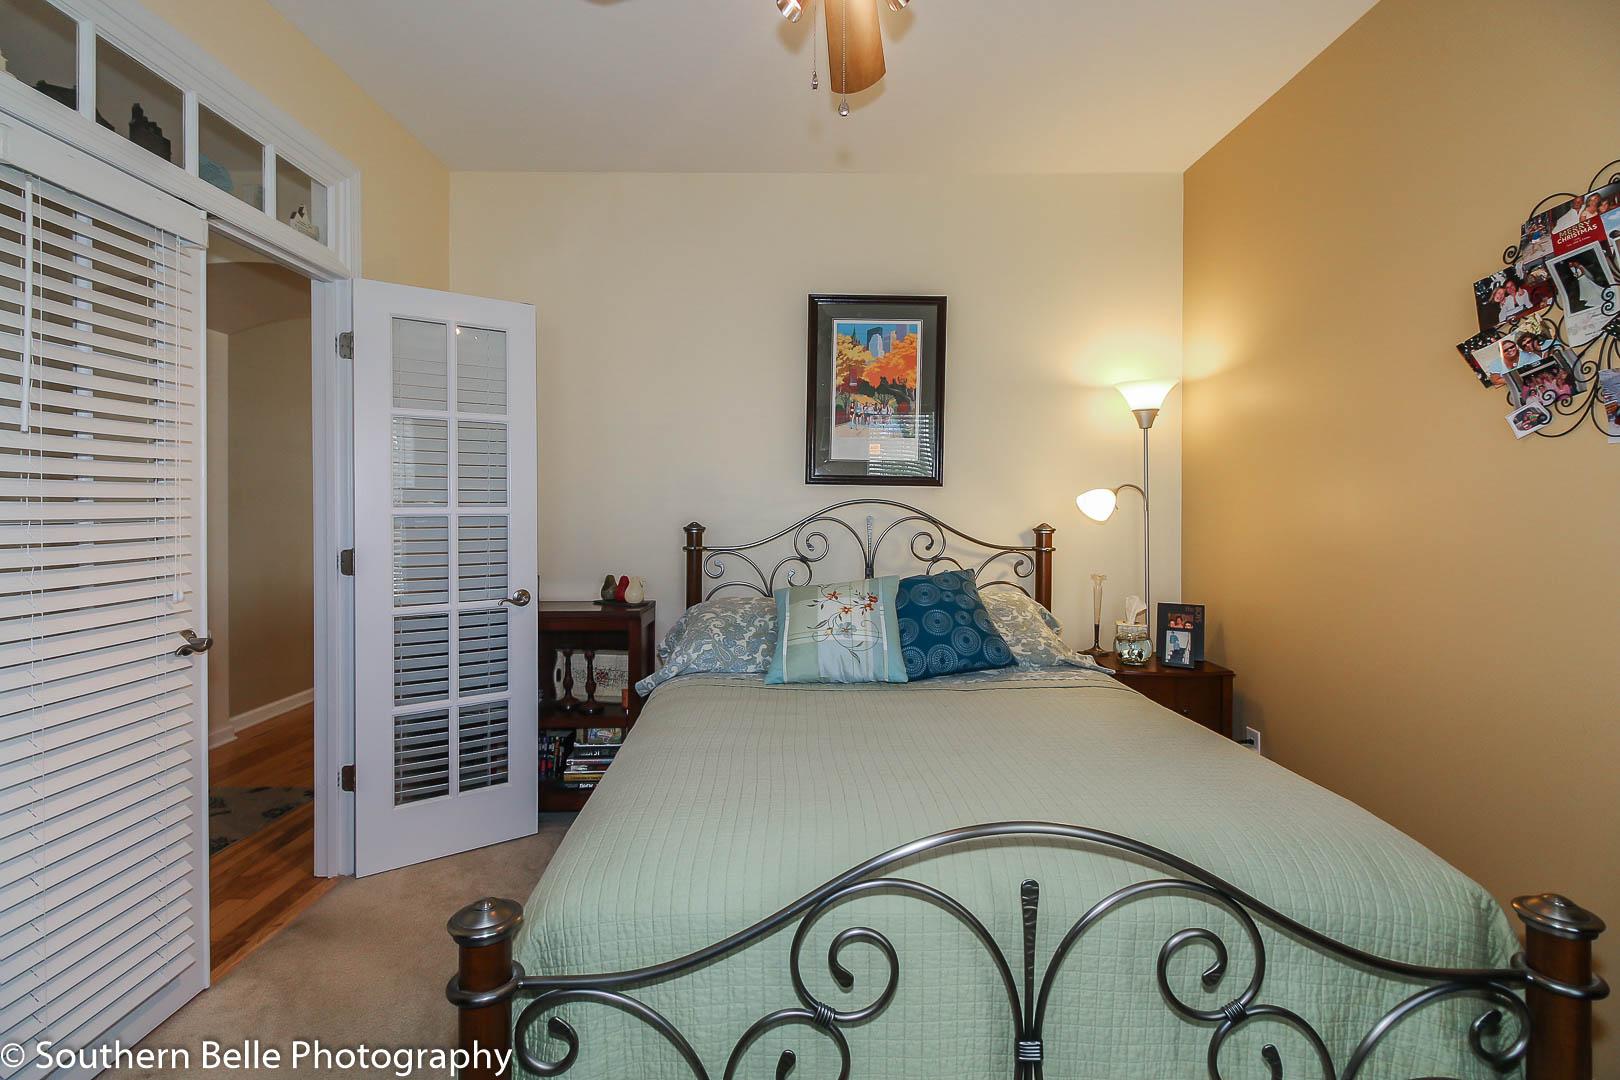 4. Bedroom Once View WM